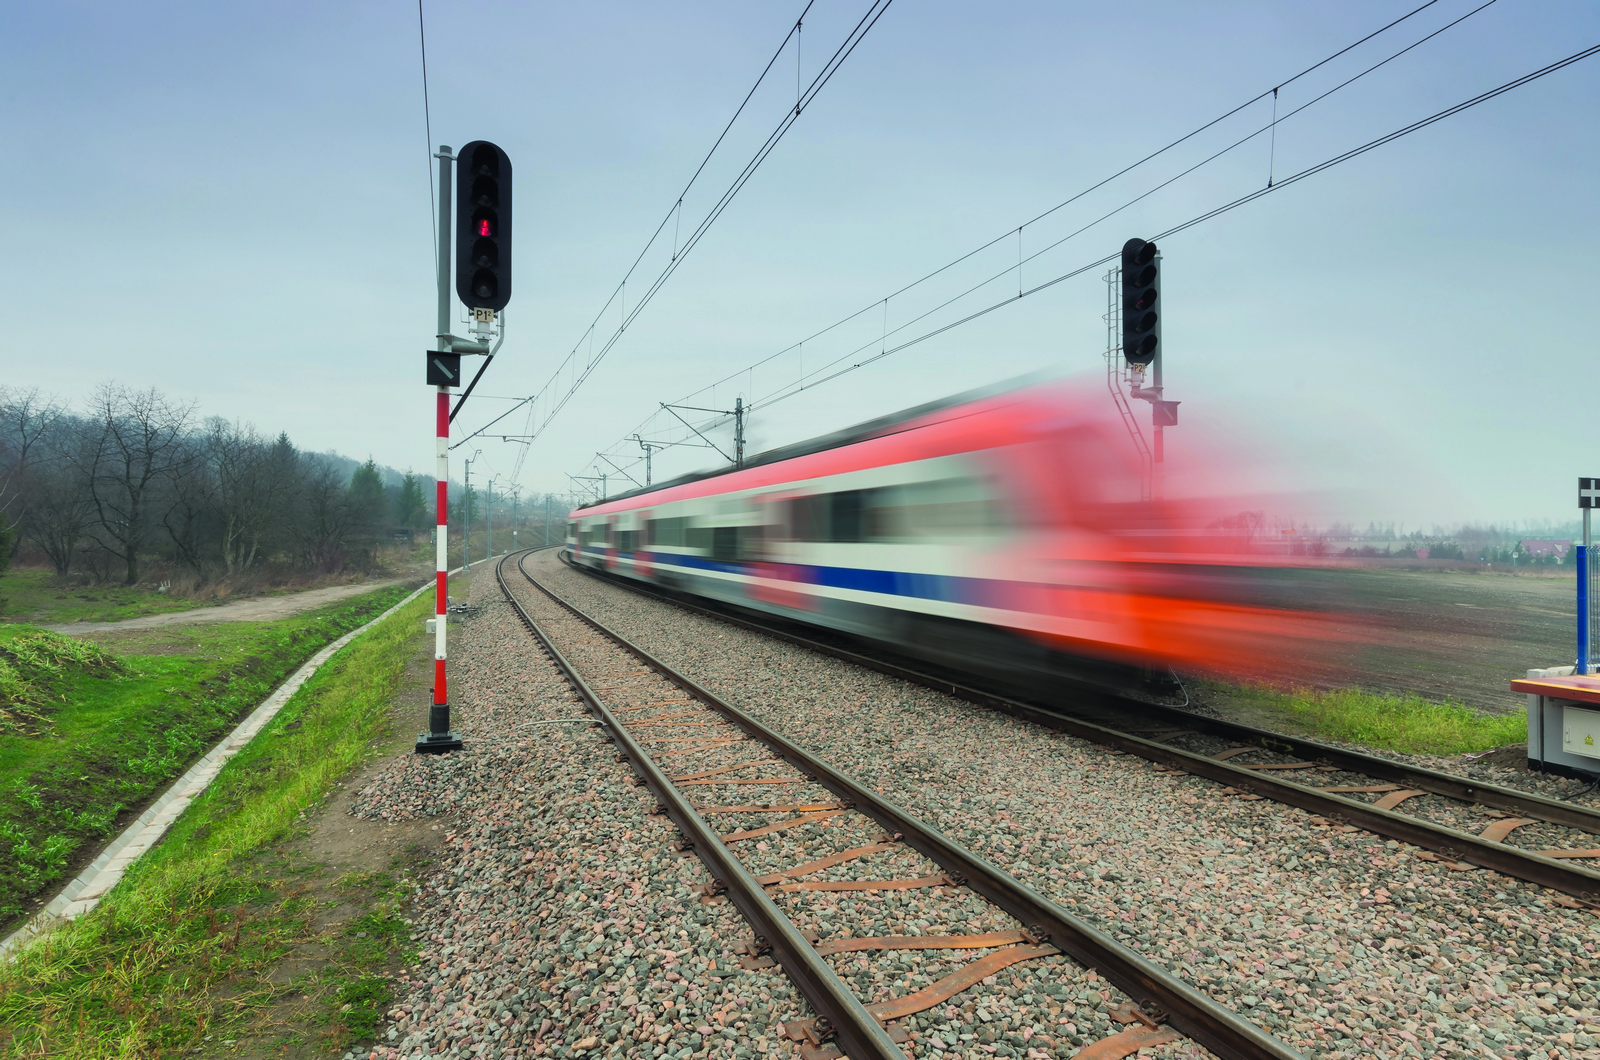 Pociąg do kolei niestety, opóźniony